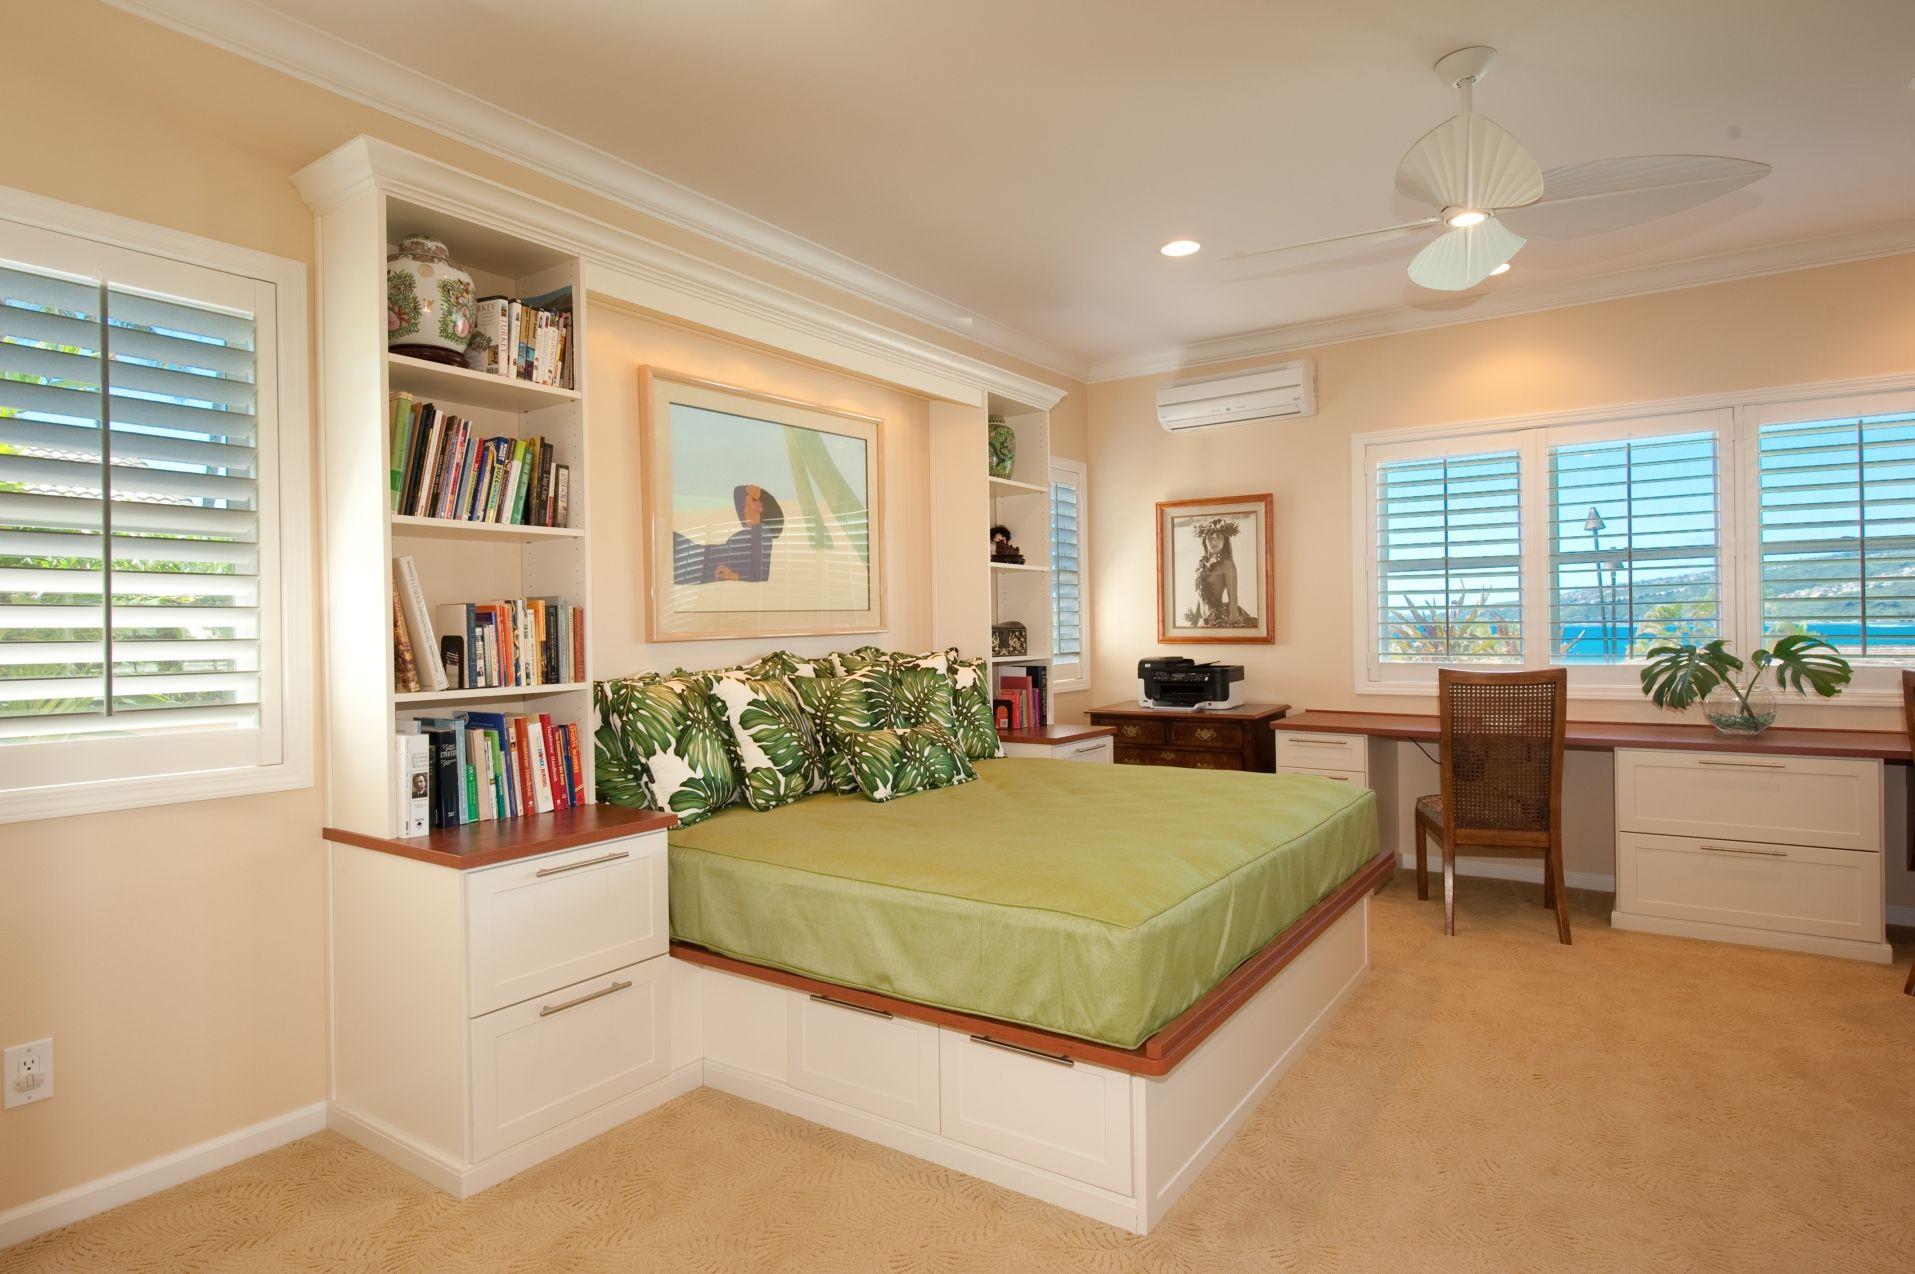 Hawaii Archipelago Luxury Home Designs